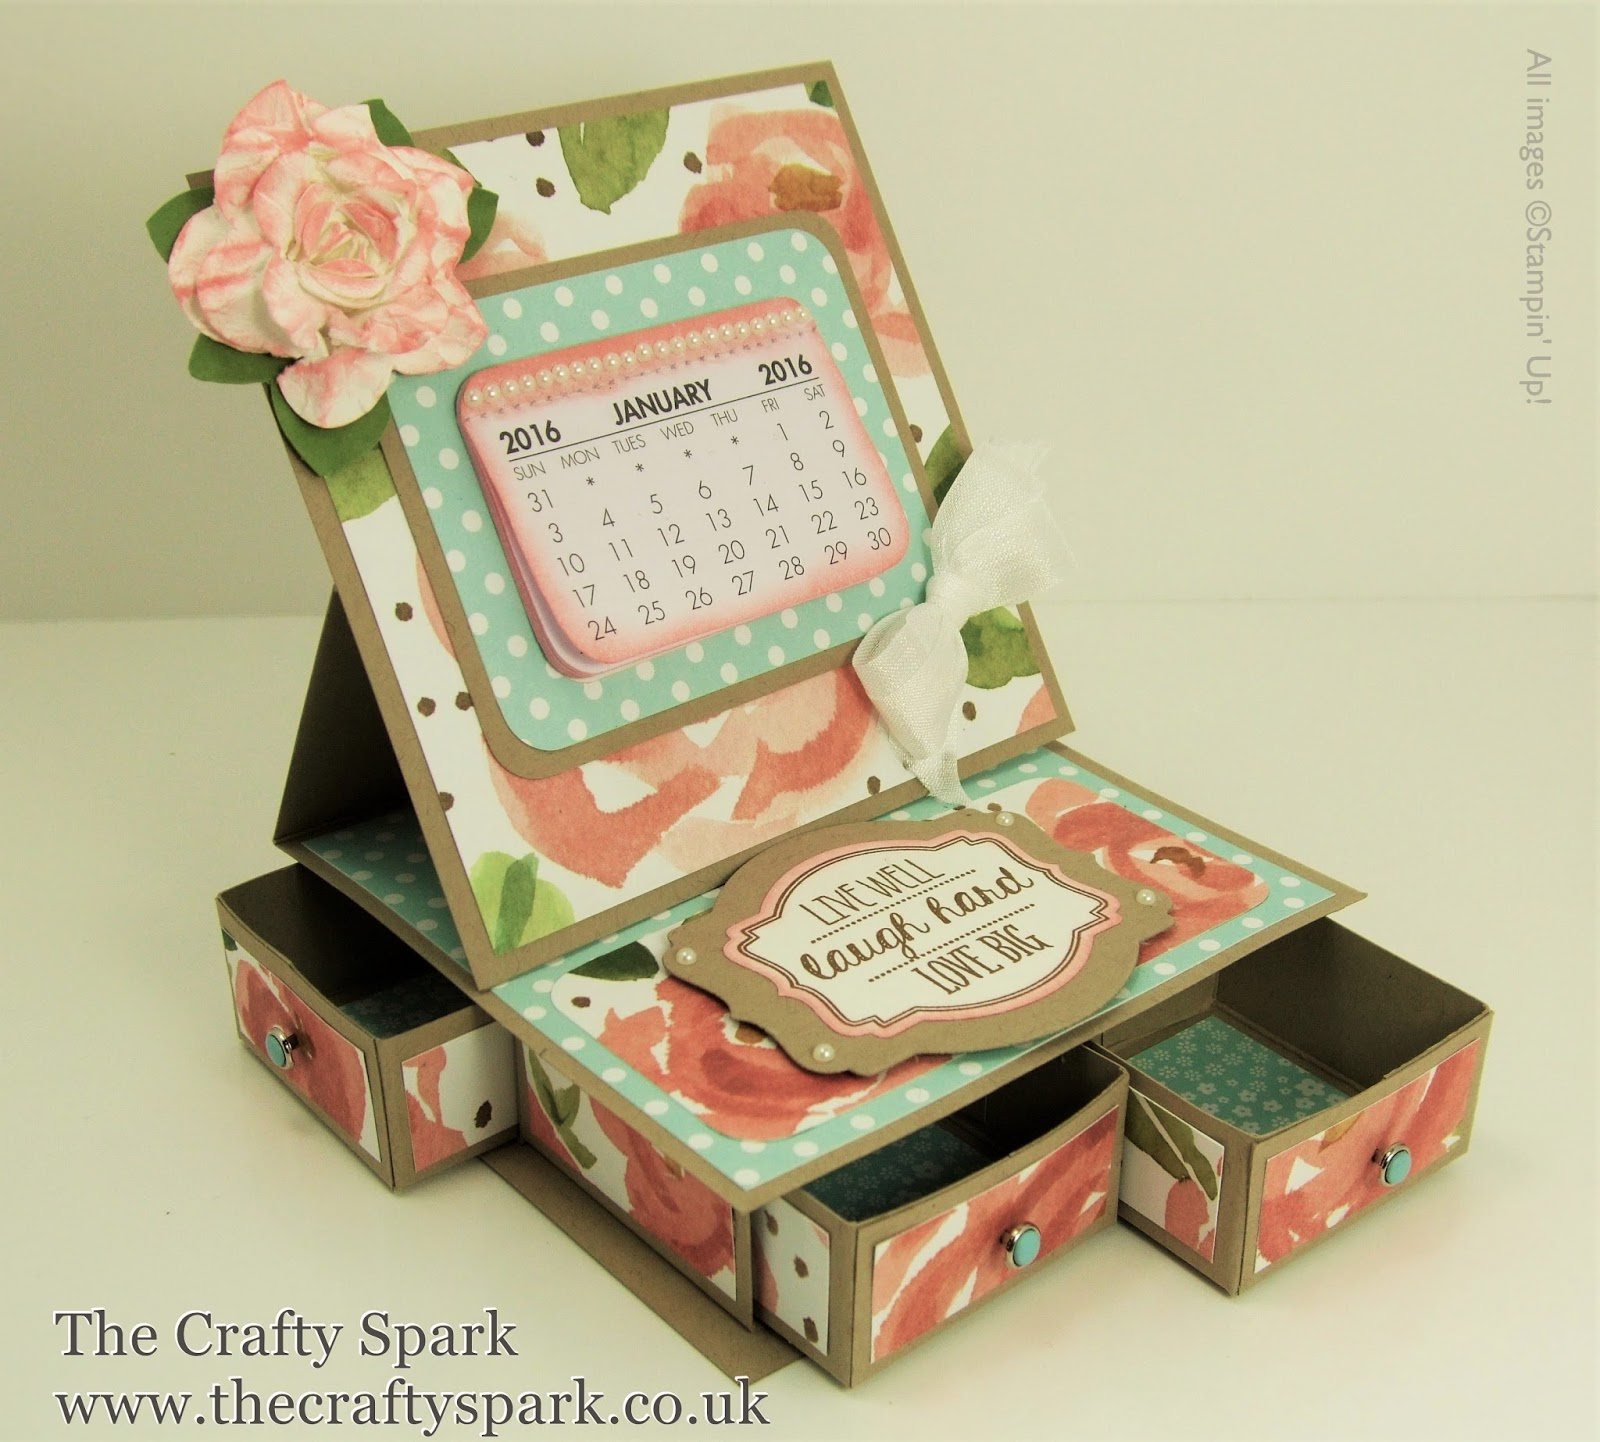 Desktop Calendar and Organiser with English Garden Designer